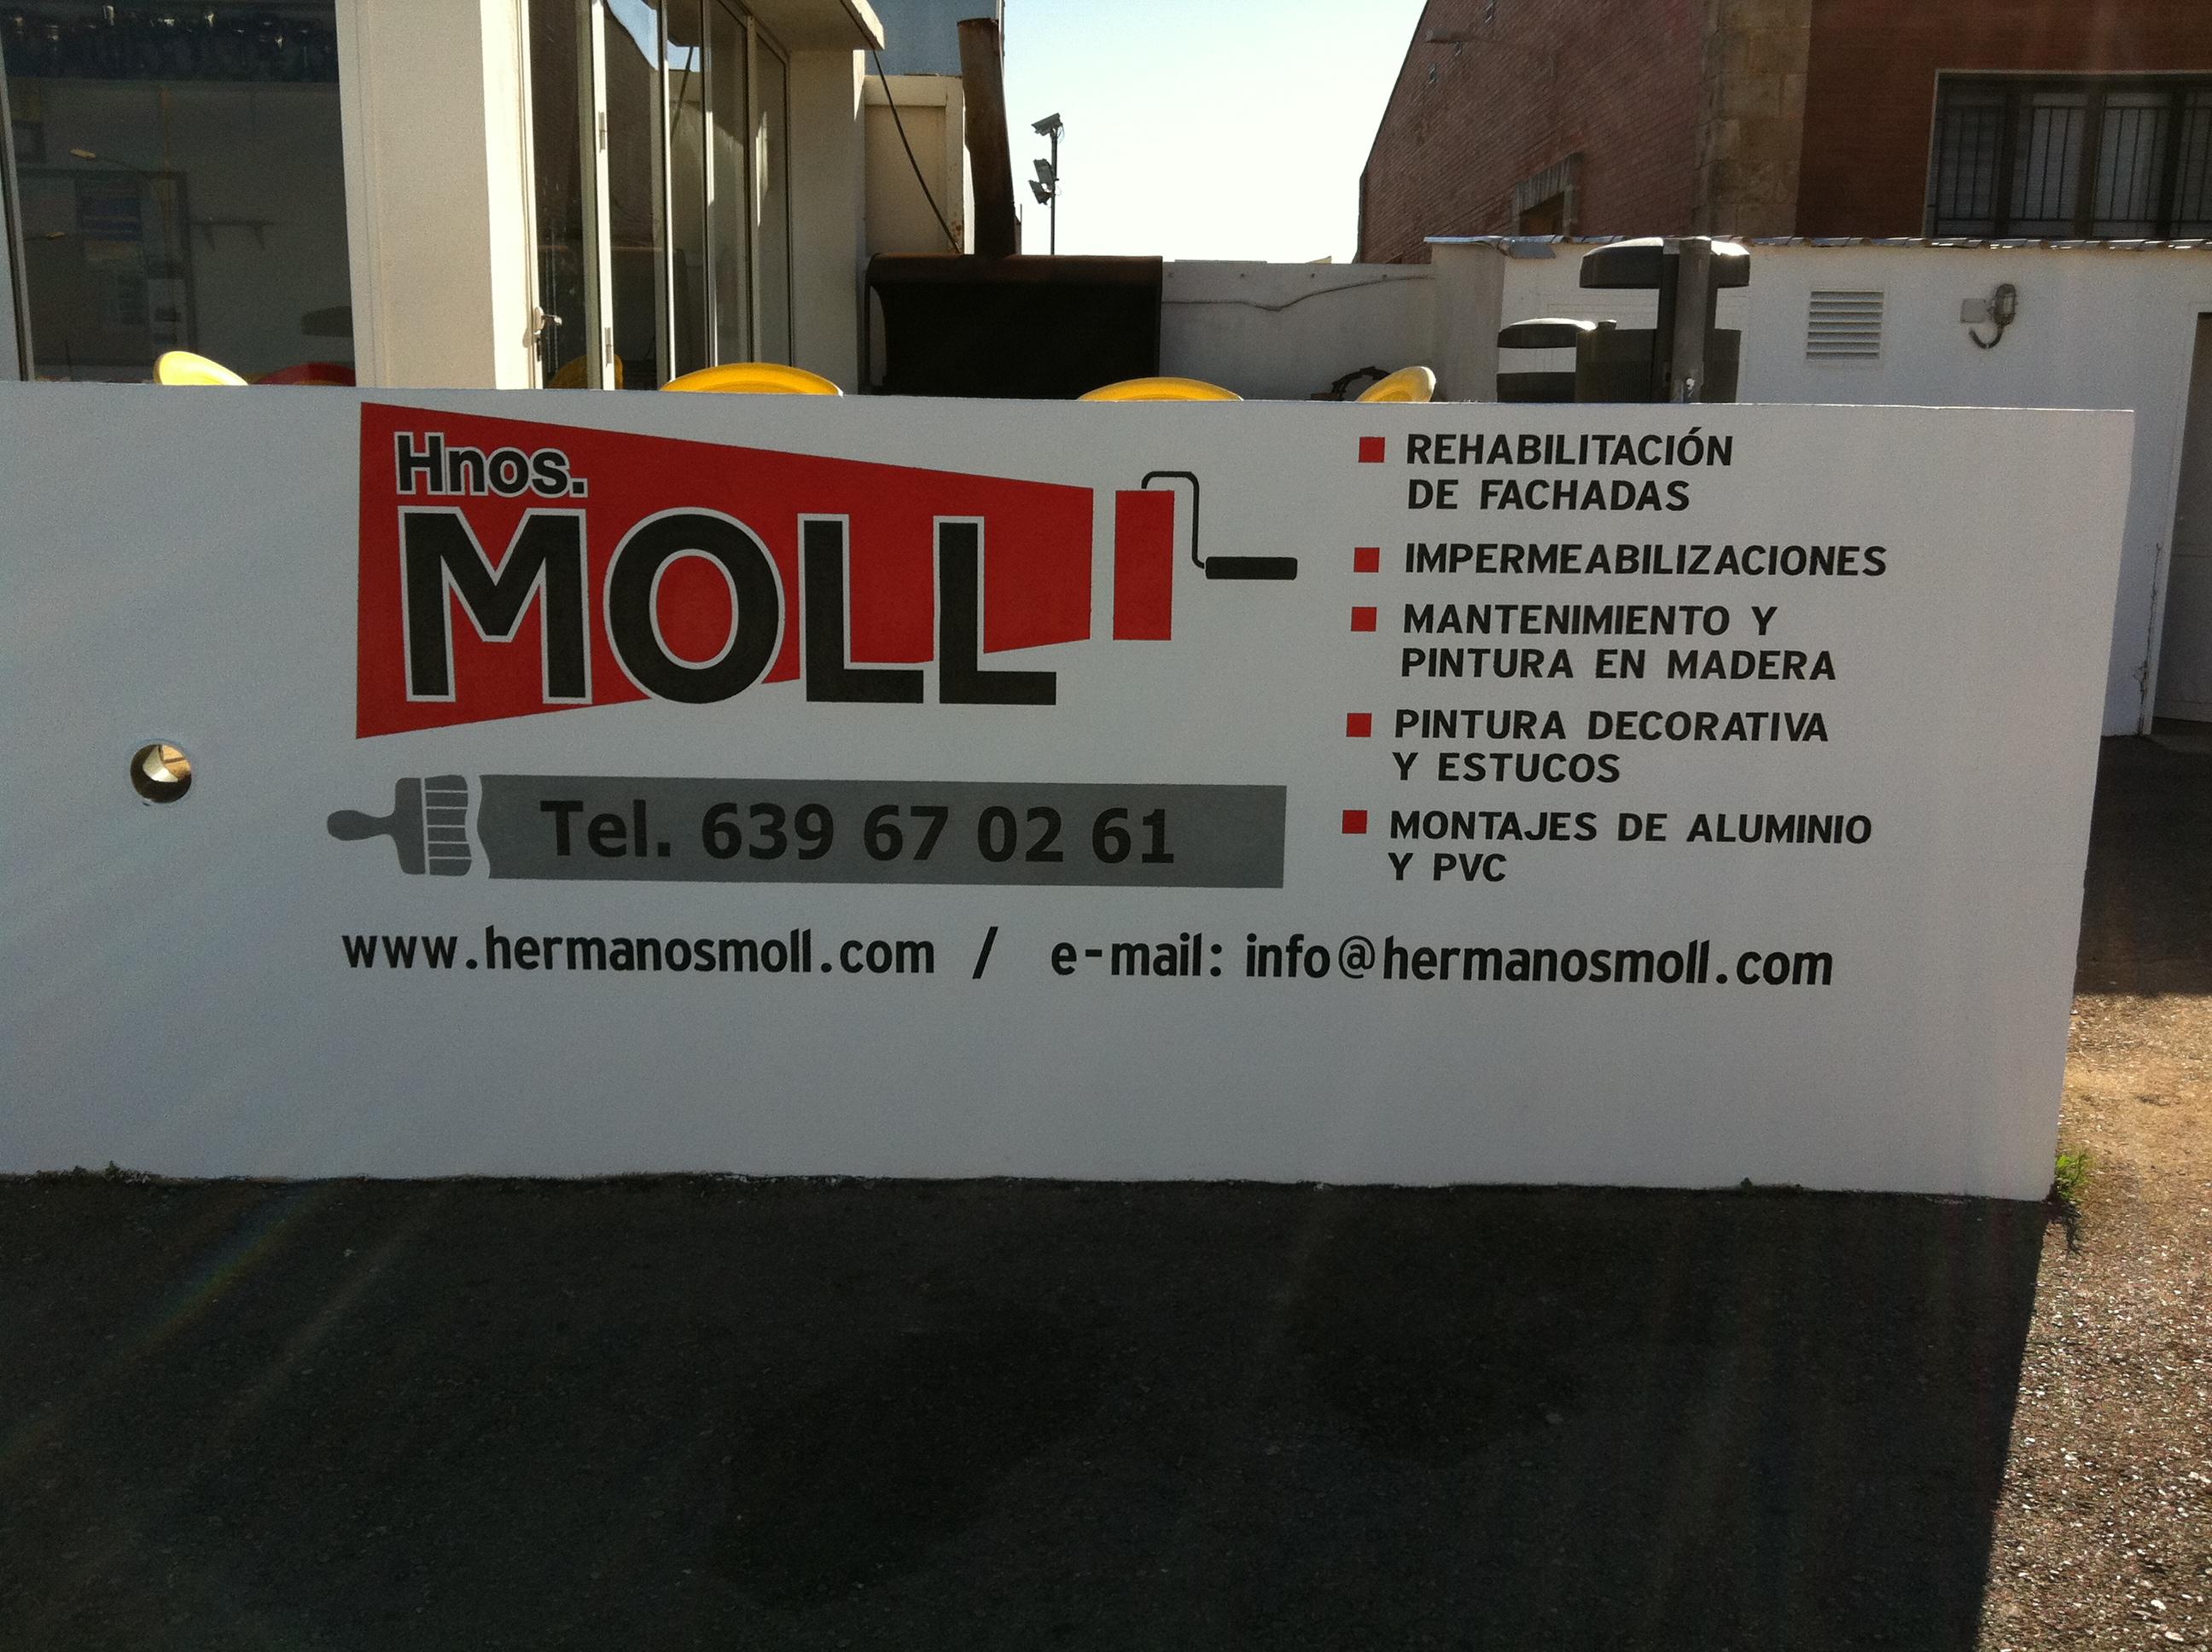 Hermanos Moll